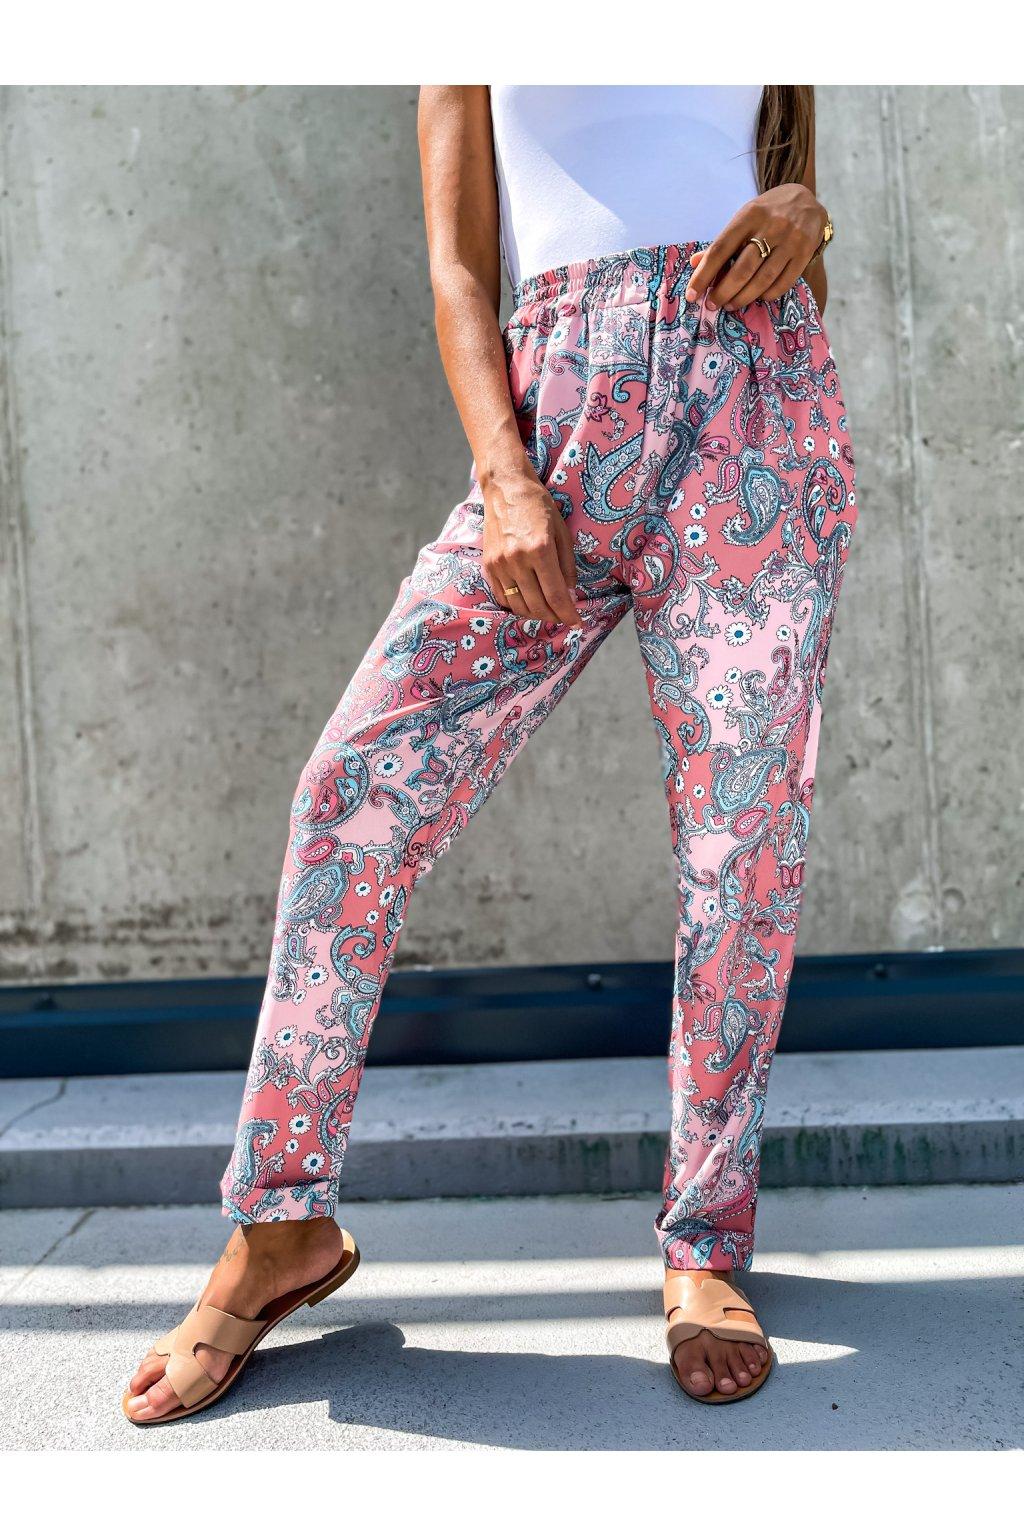 damske satenove kalhoty oriental powder pink eshopat cz 4